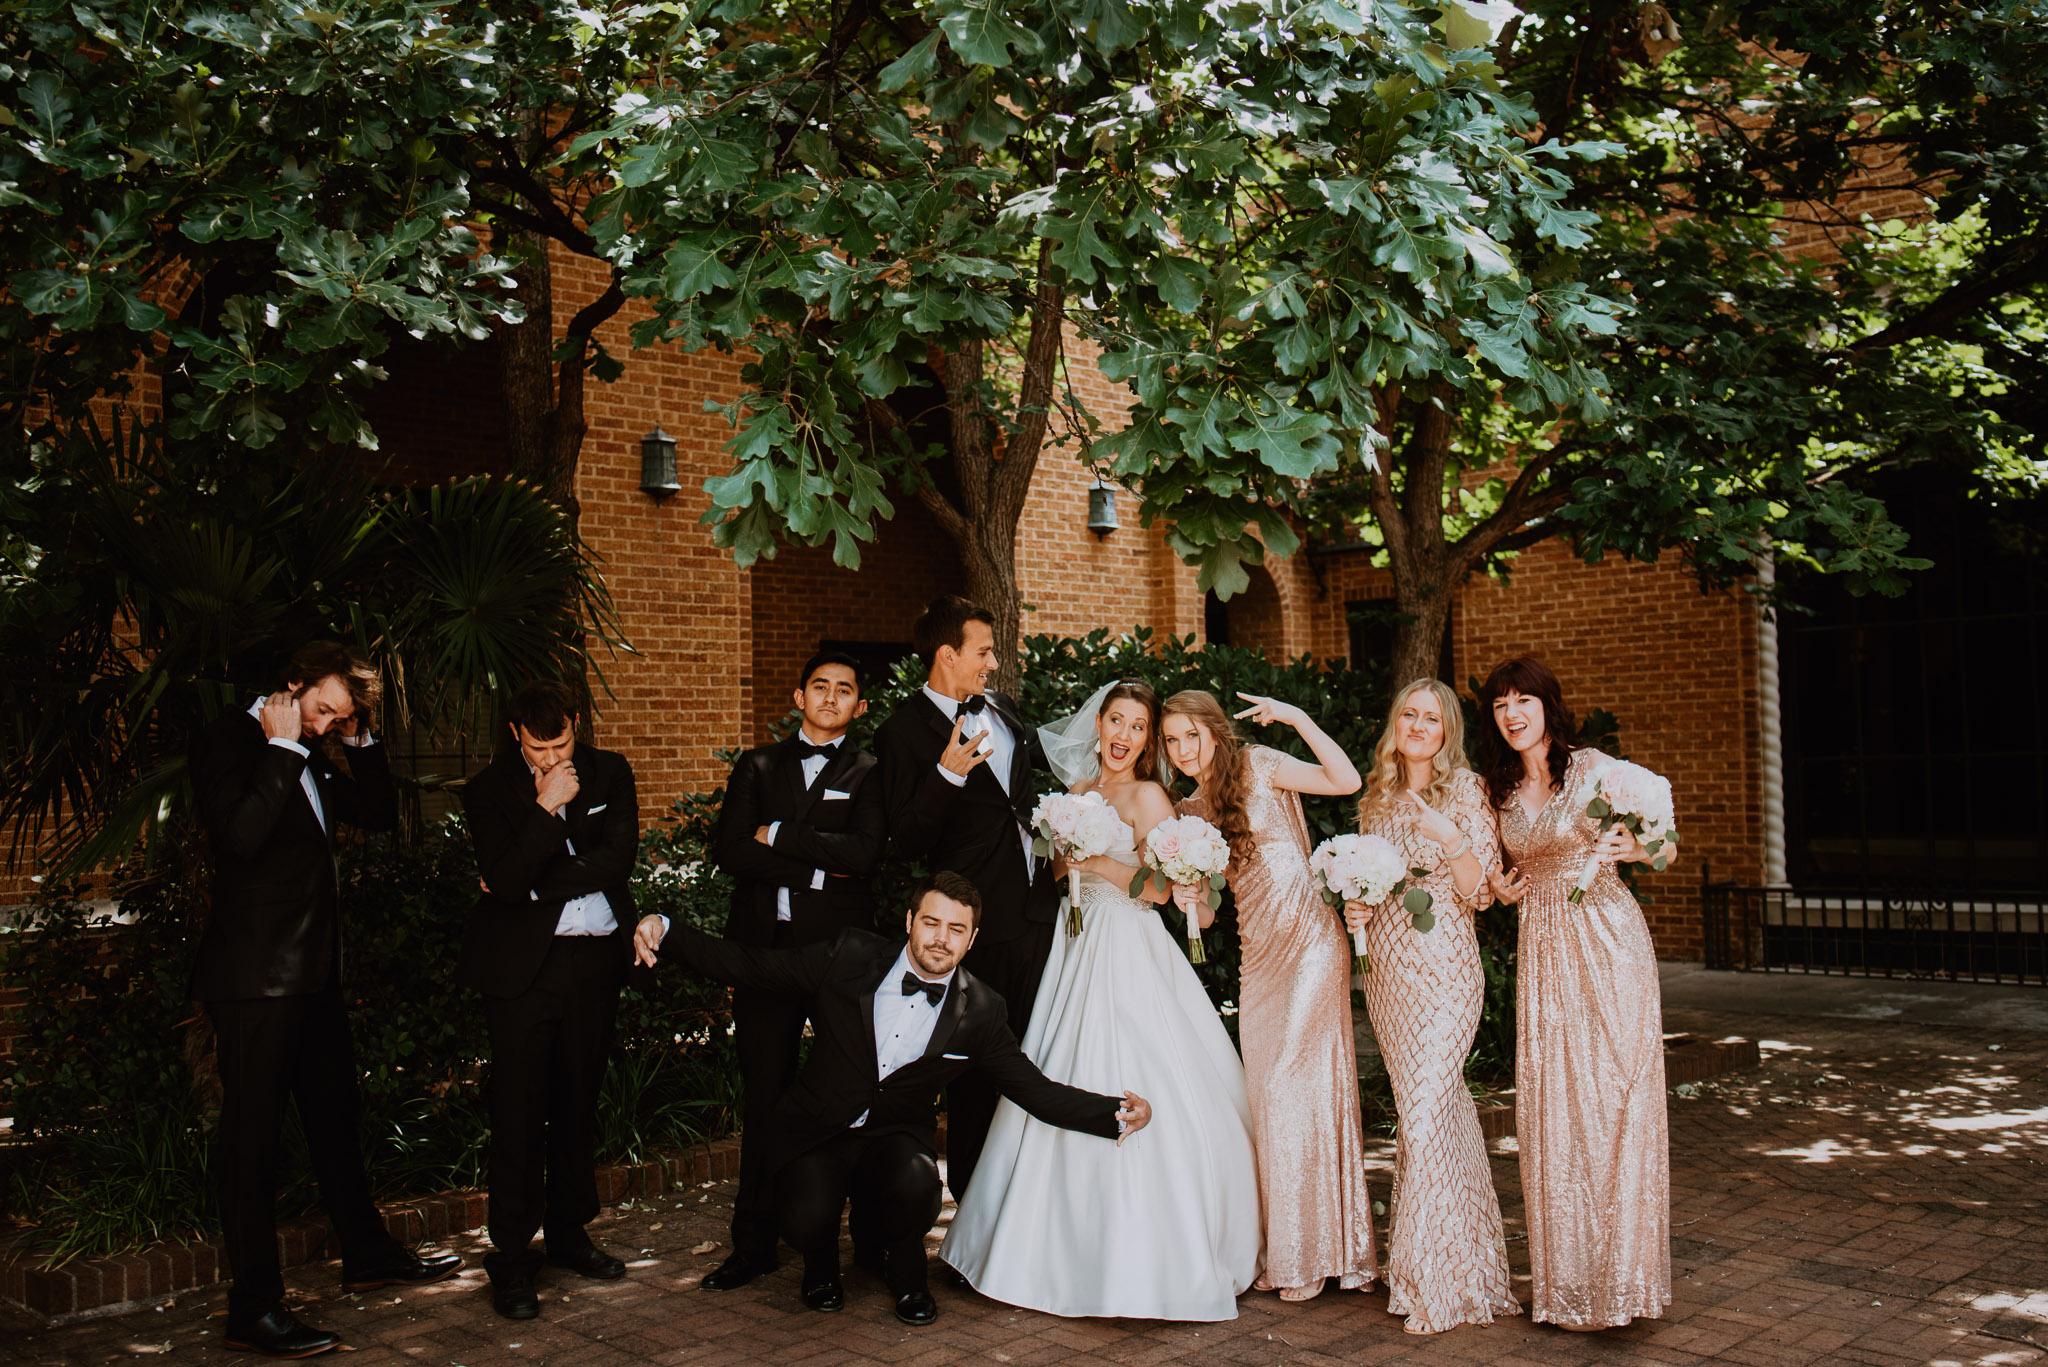 Bentwood-country-club-wedding-shea-tyson-0012.jpg